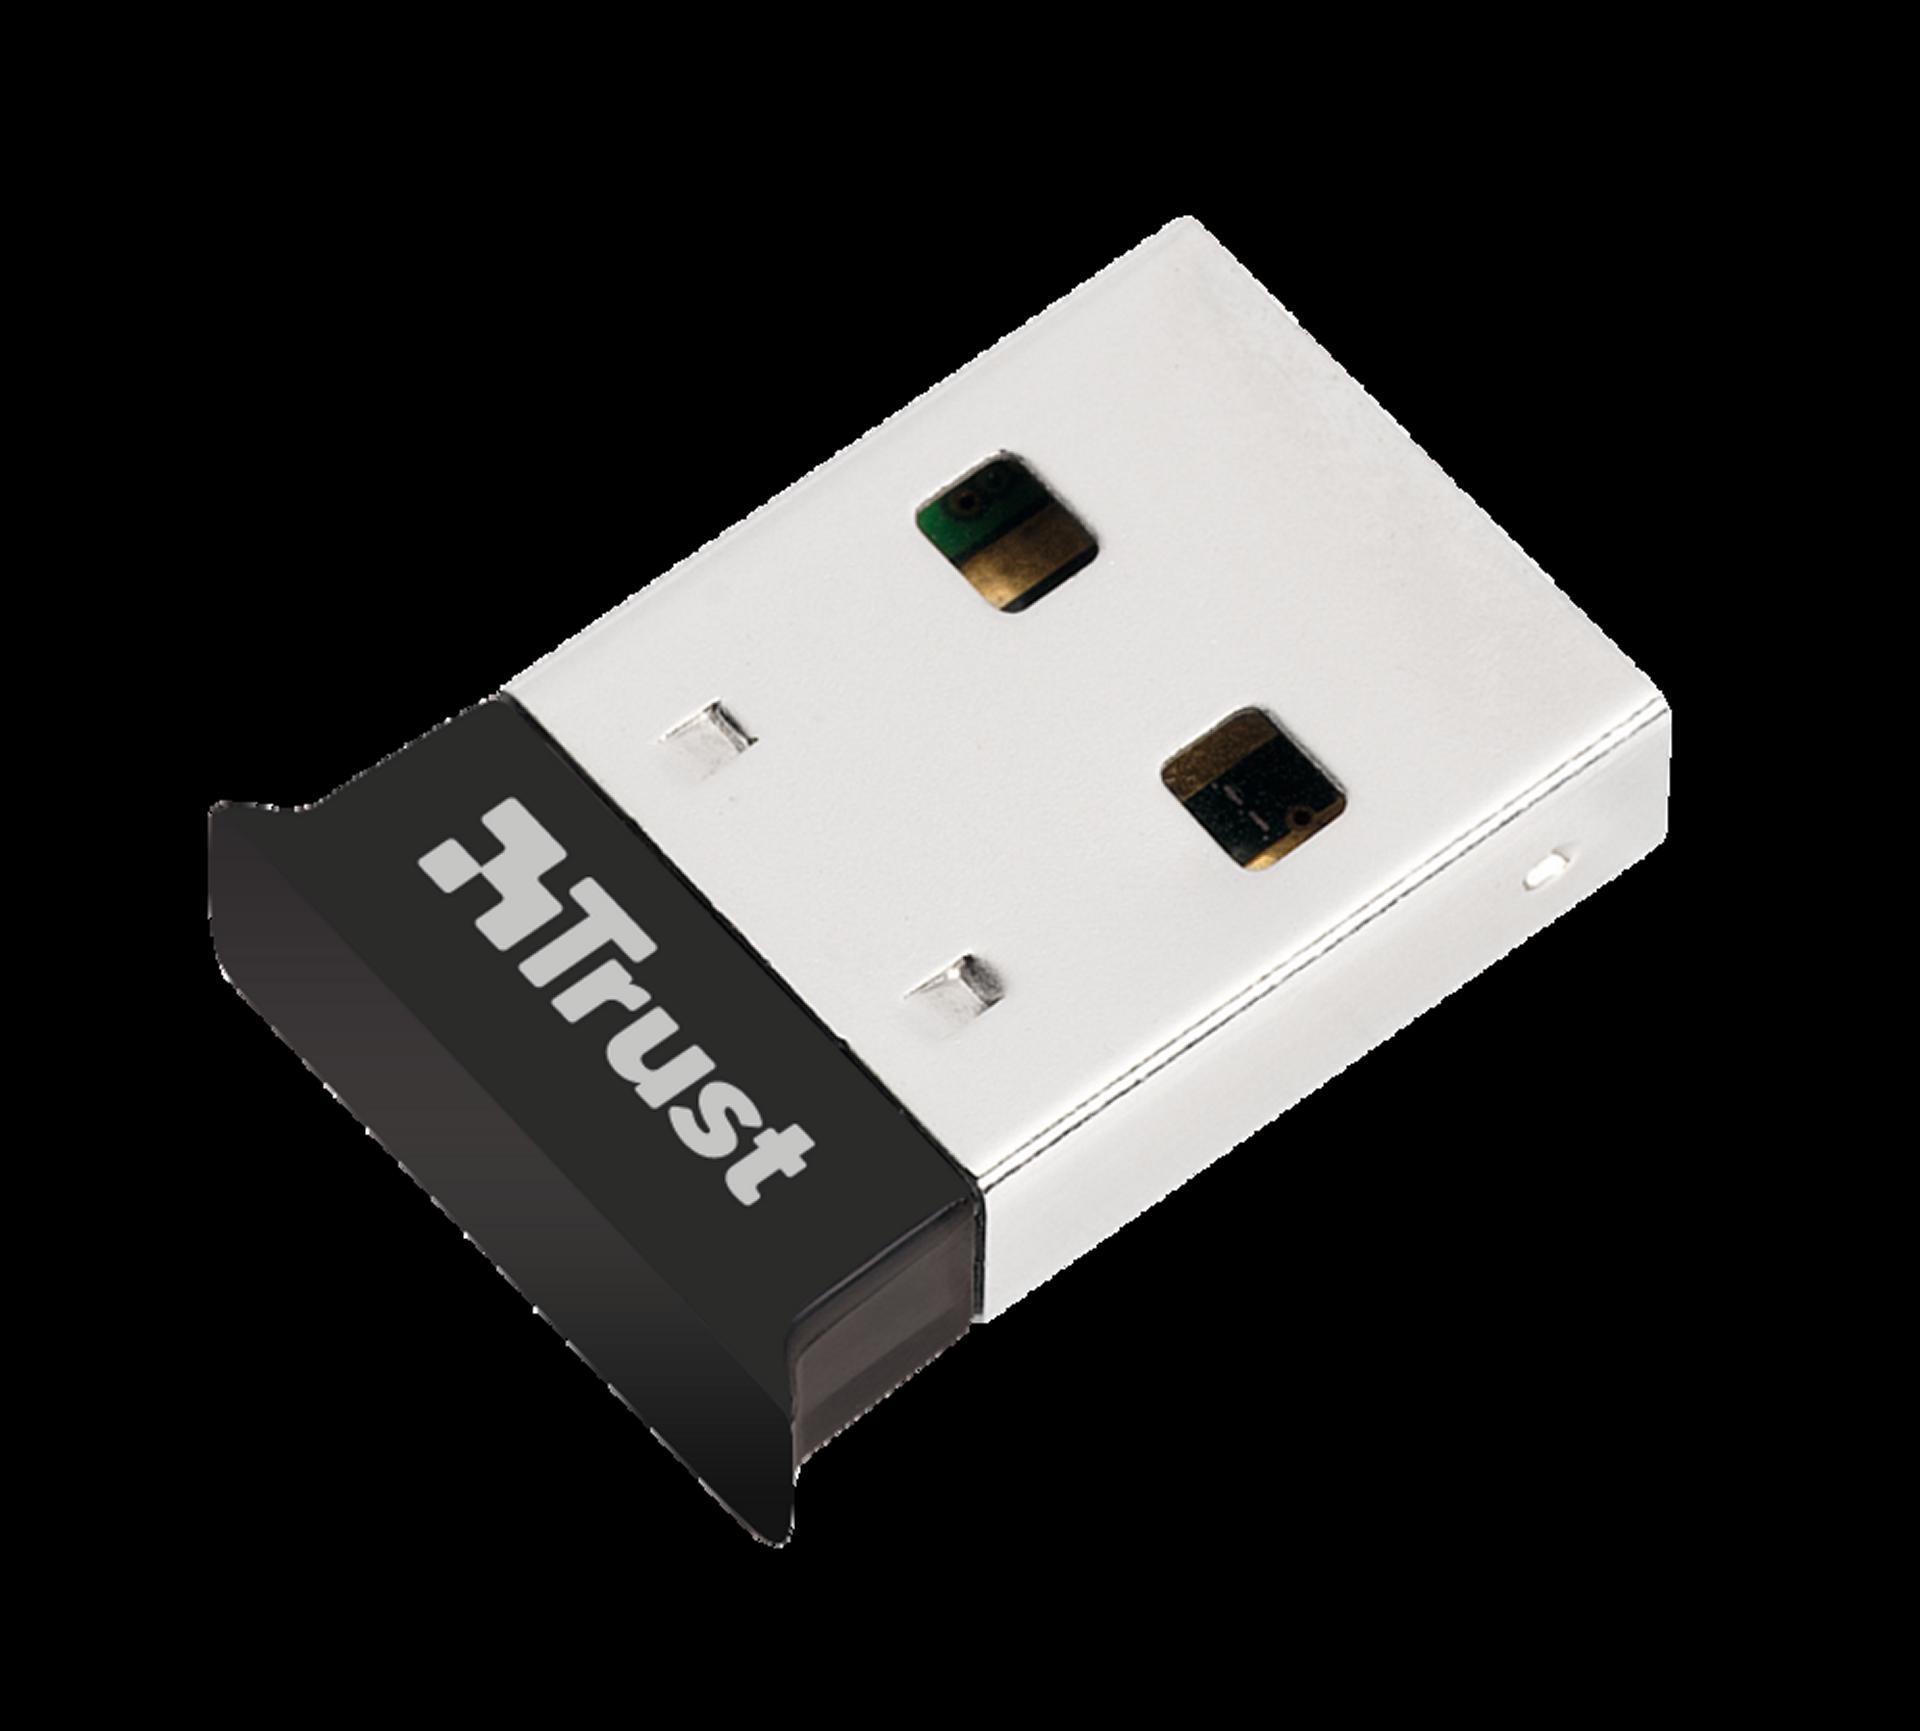 BT adapter TRUST Bluetooth 4.0. USB Adapter